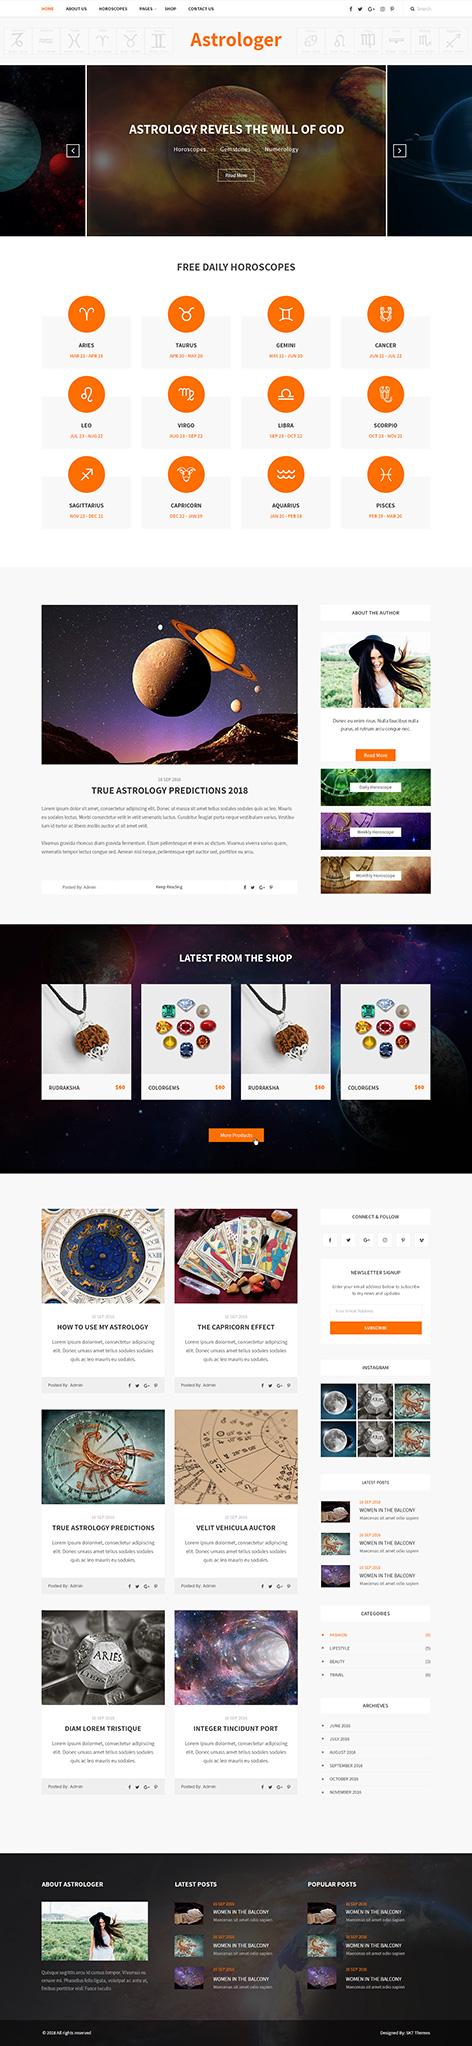 astrology wordpress theme1 1 - Astrologer